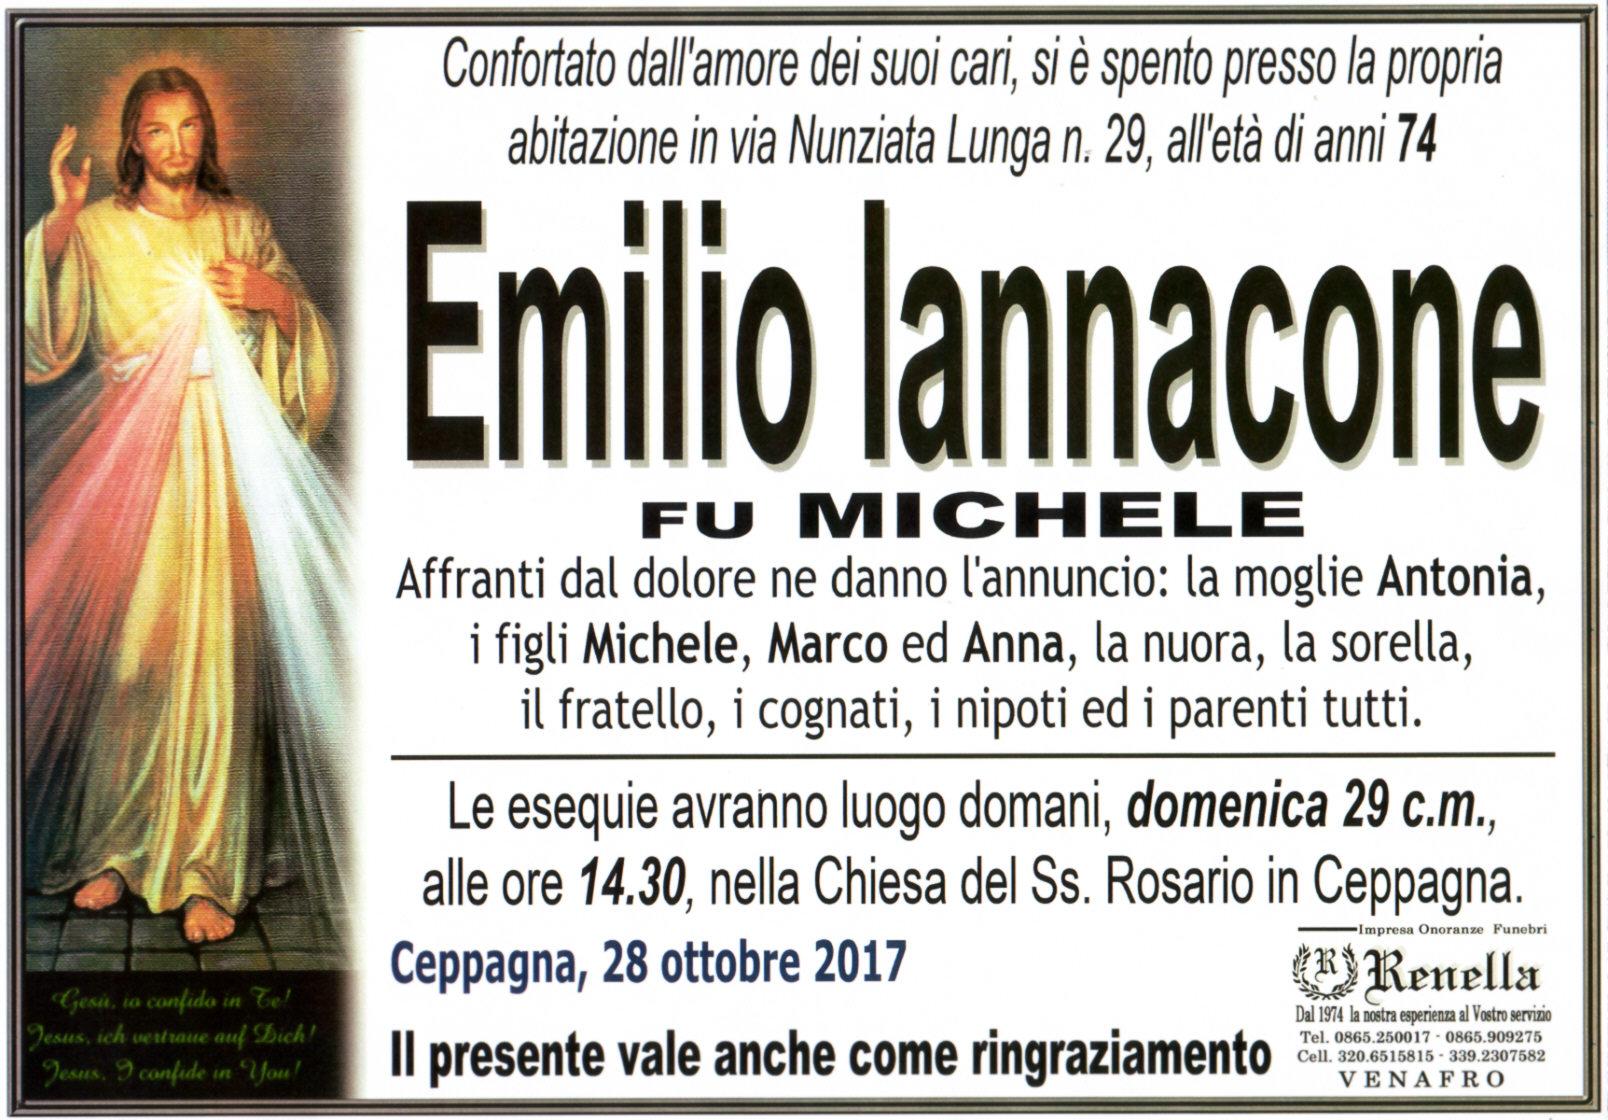 Emilio Iannacone – 28/10/2017 – Ceppagna – Onoranze Funebri Renella